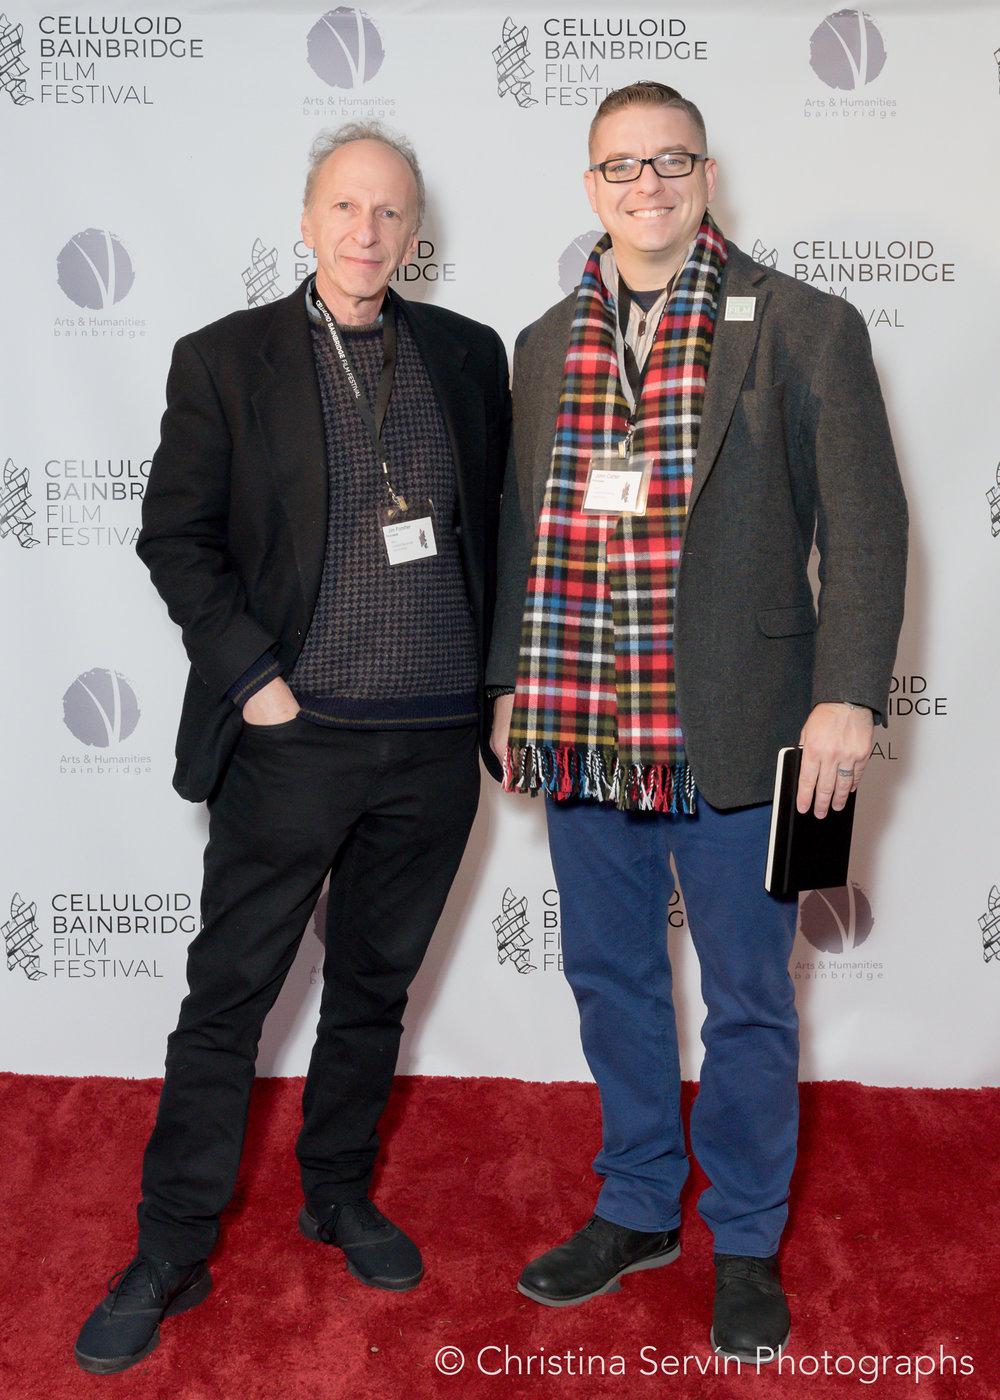 Celluloid Bainbridge Film Festival Bainbridge Island-56.jpg